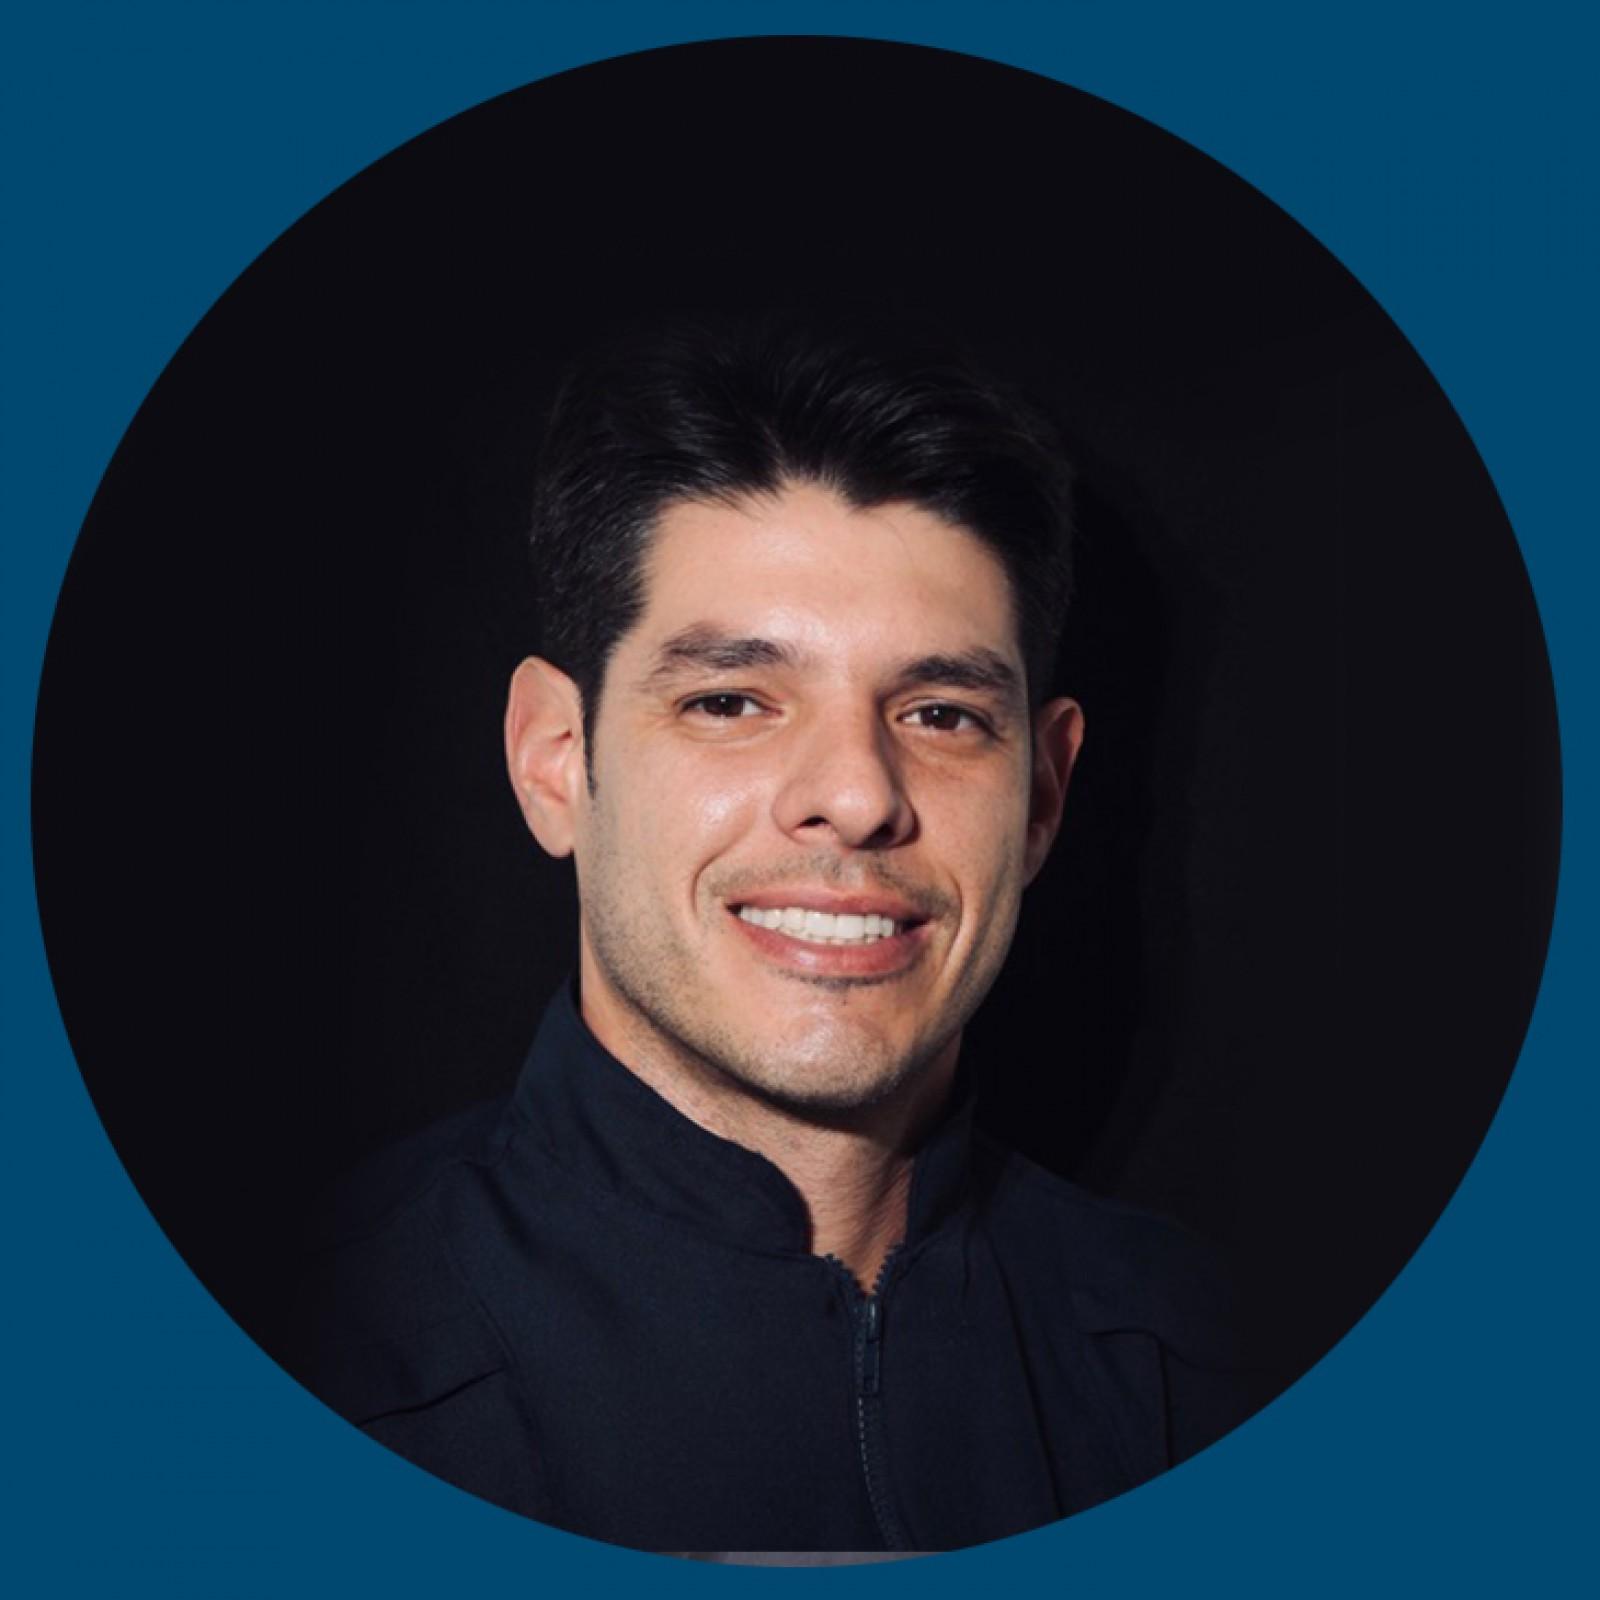 Dr. Francisco Campos